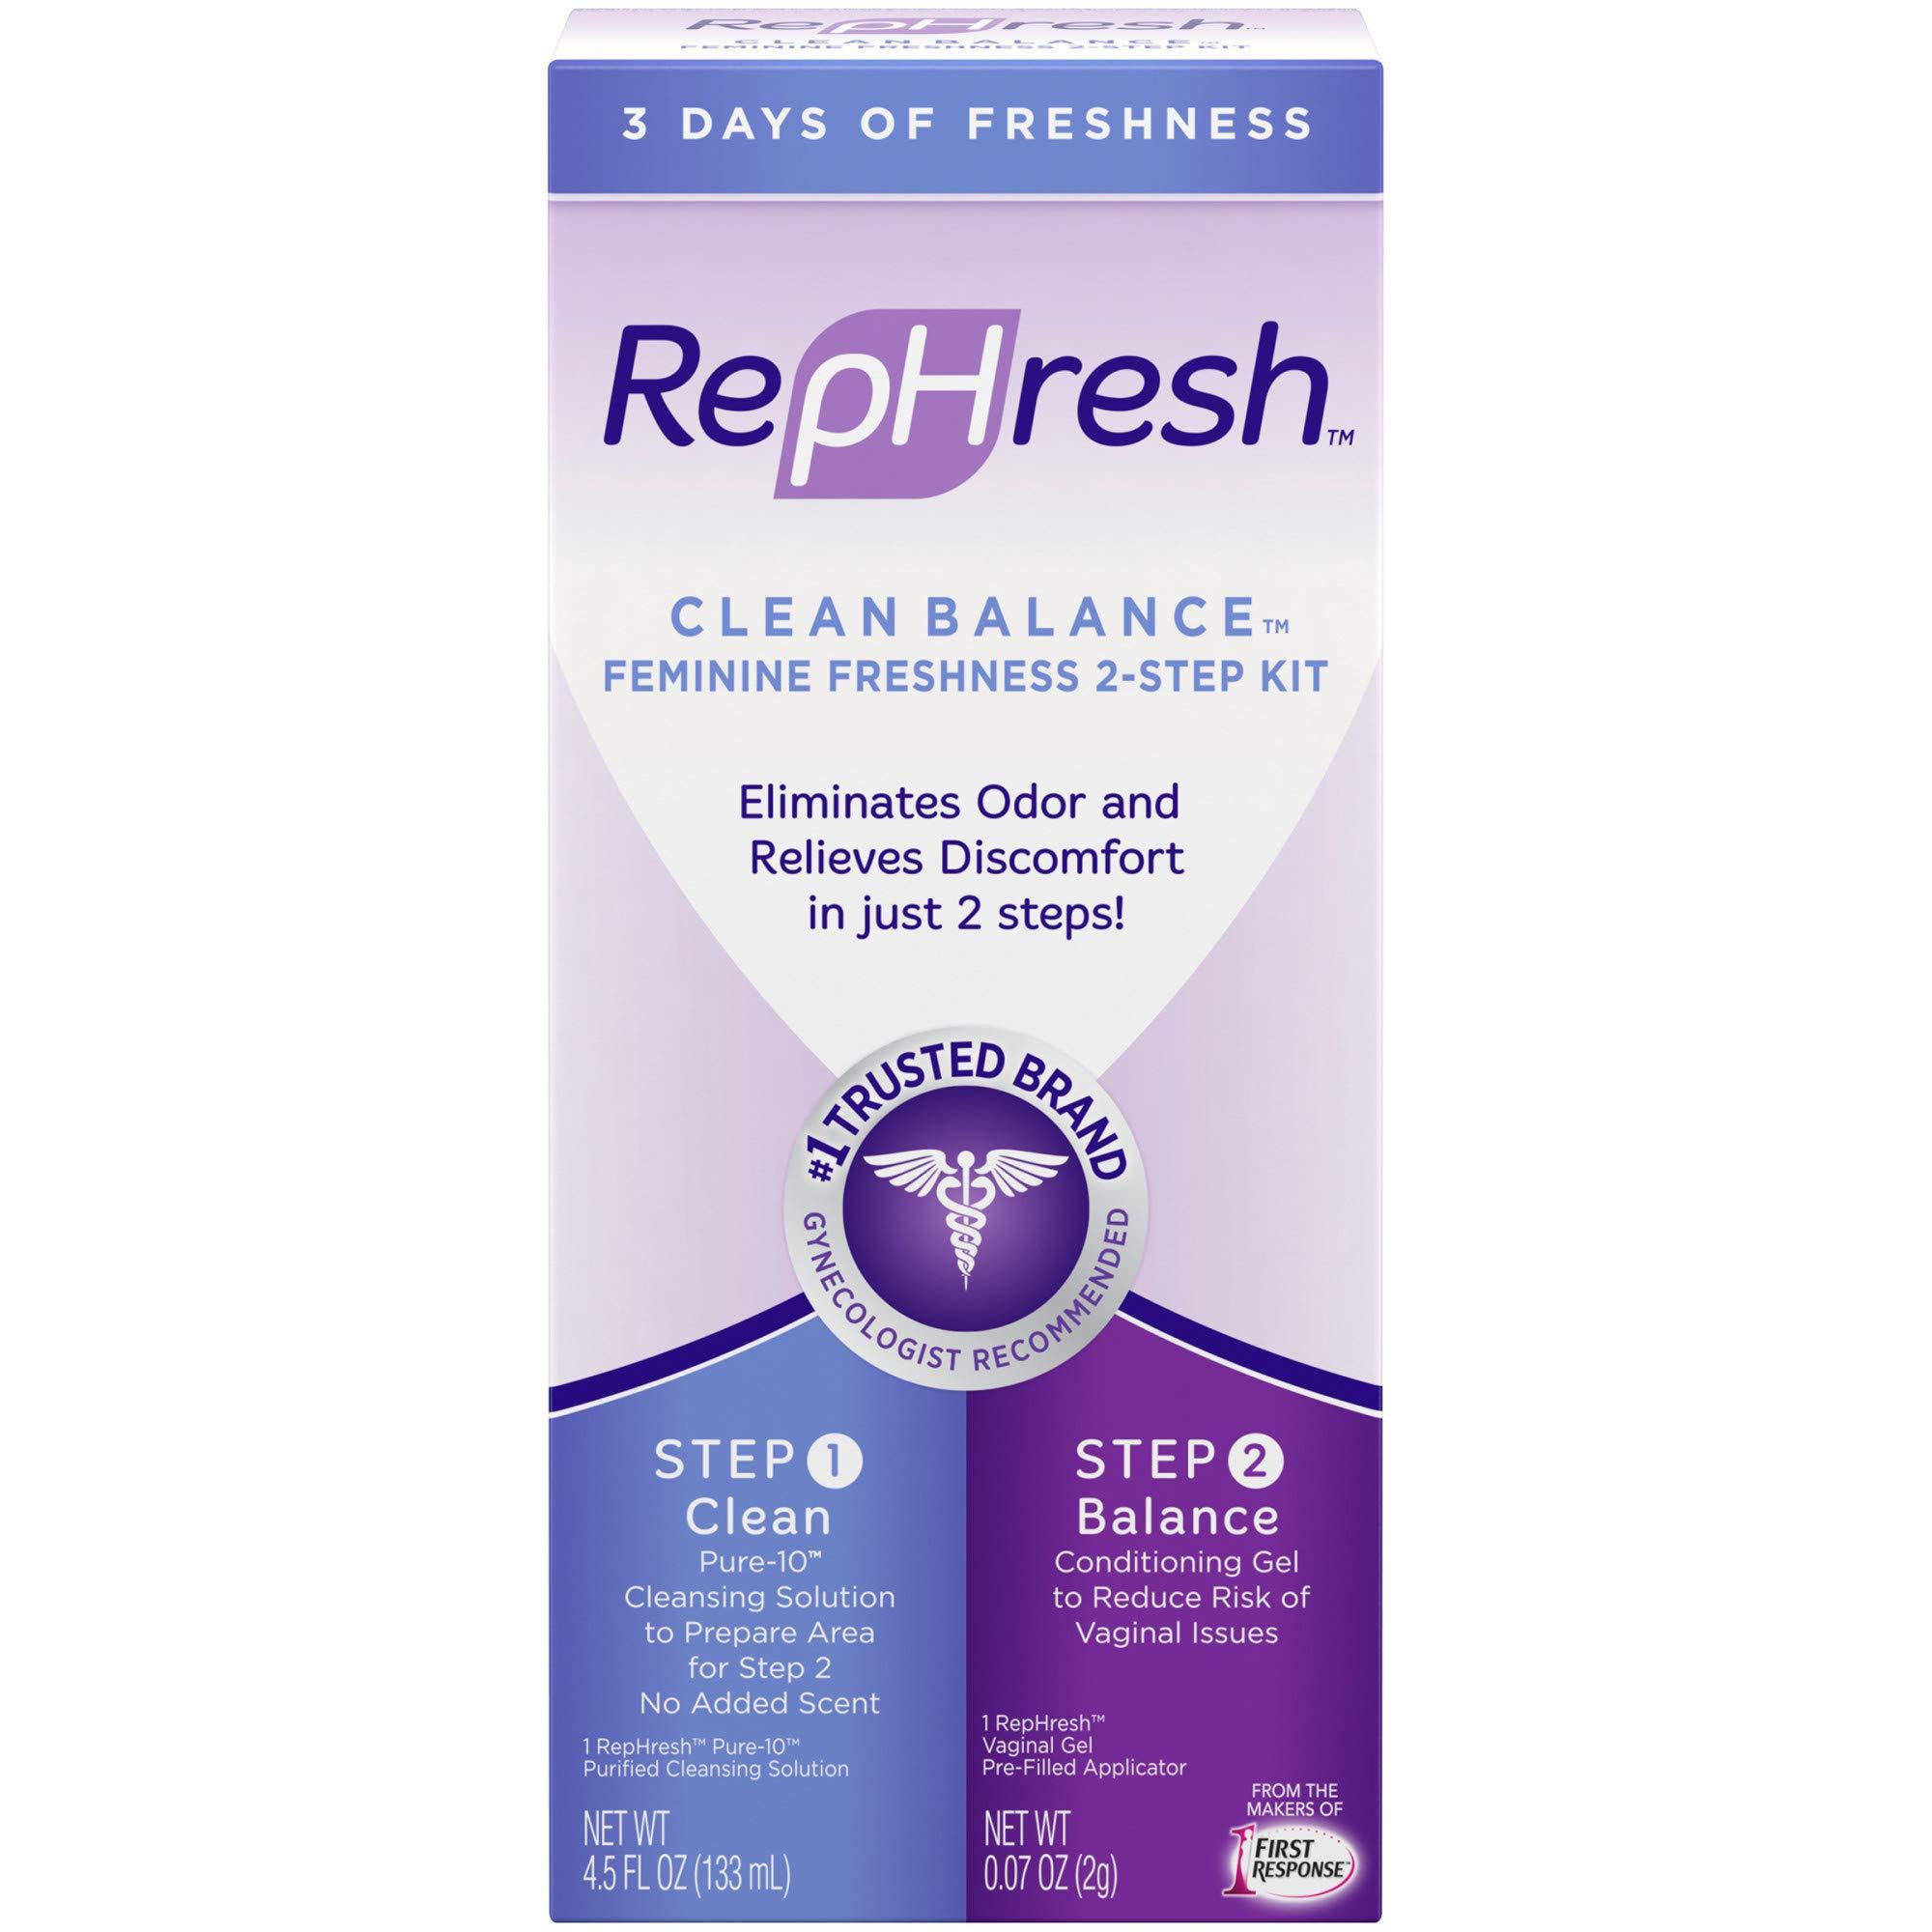 RepHresh Clean Balance Feminine Freshness Kit (Part 1 Cleans: 4.5oz Bottle; Part 2 Balances: 0.07 oz Gel Applicator)